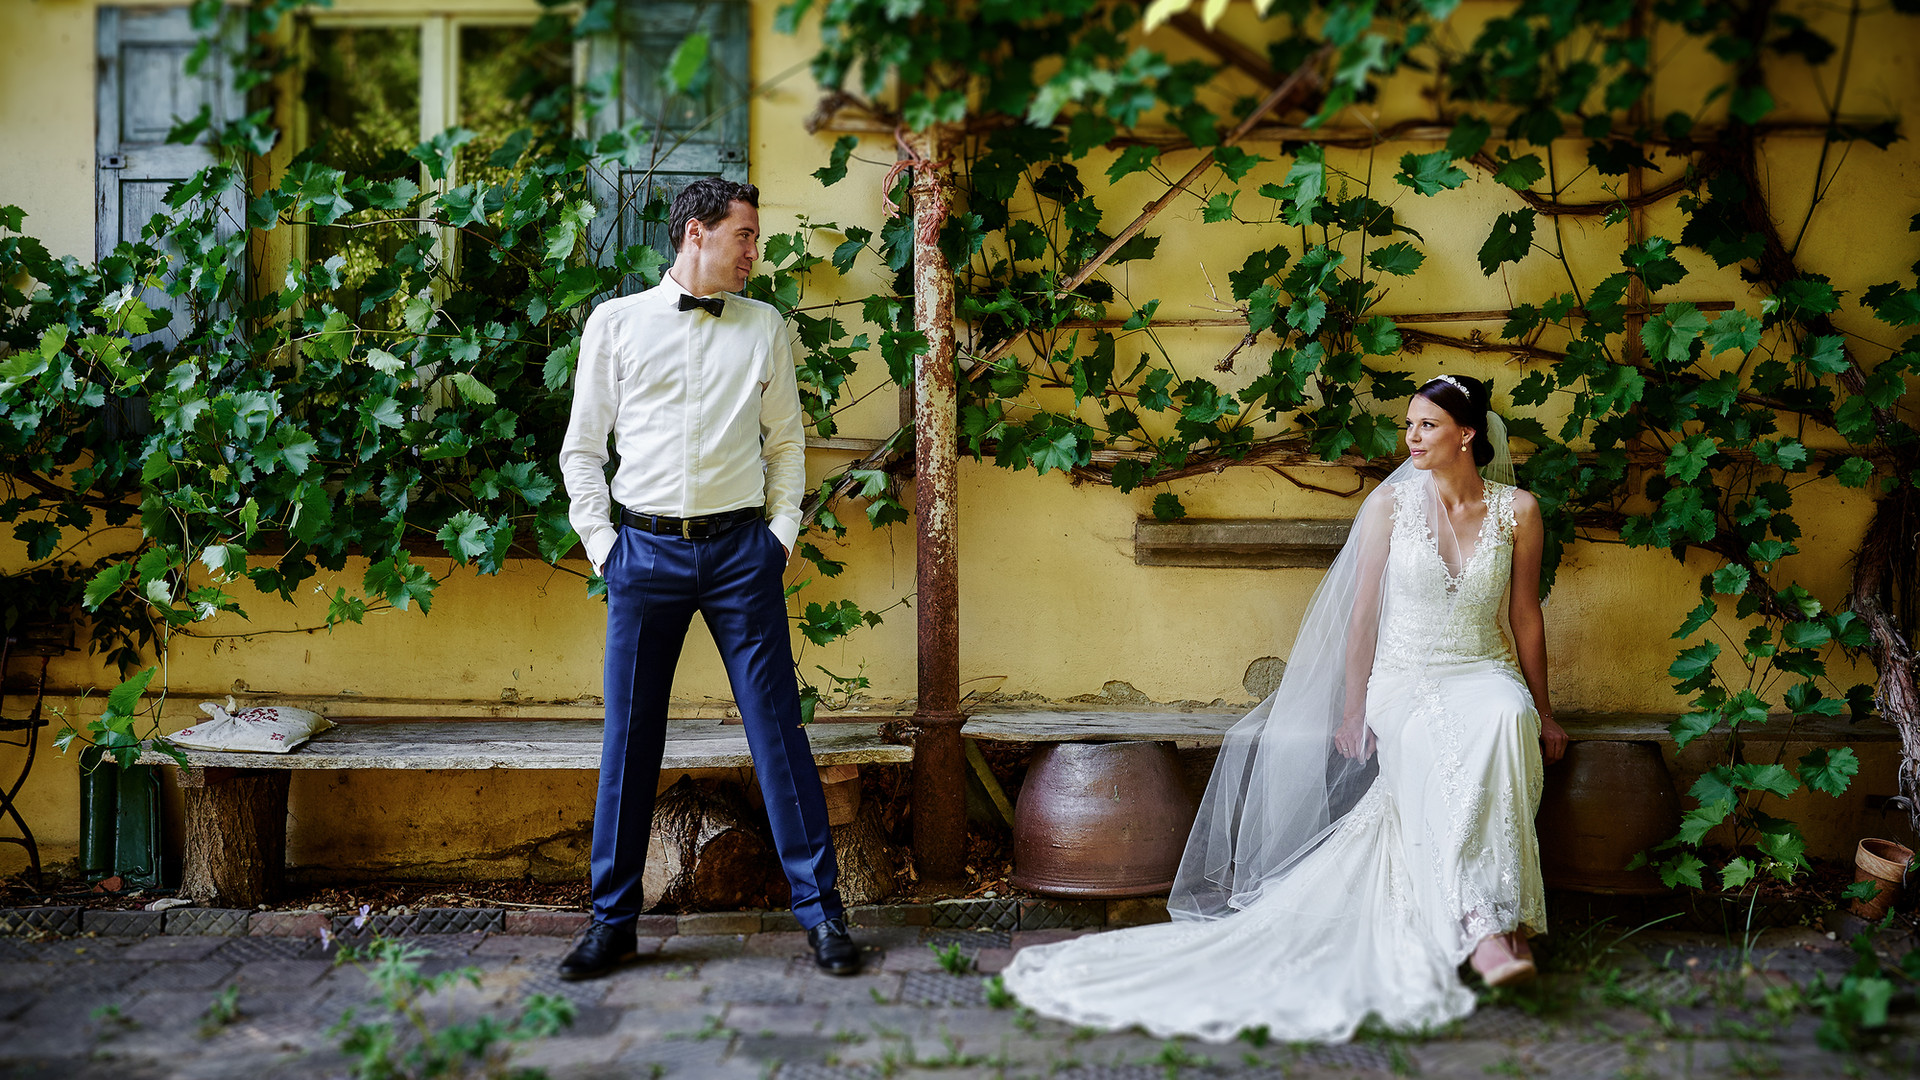 Hochzeitsfotograf Straubig